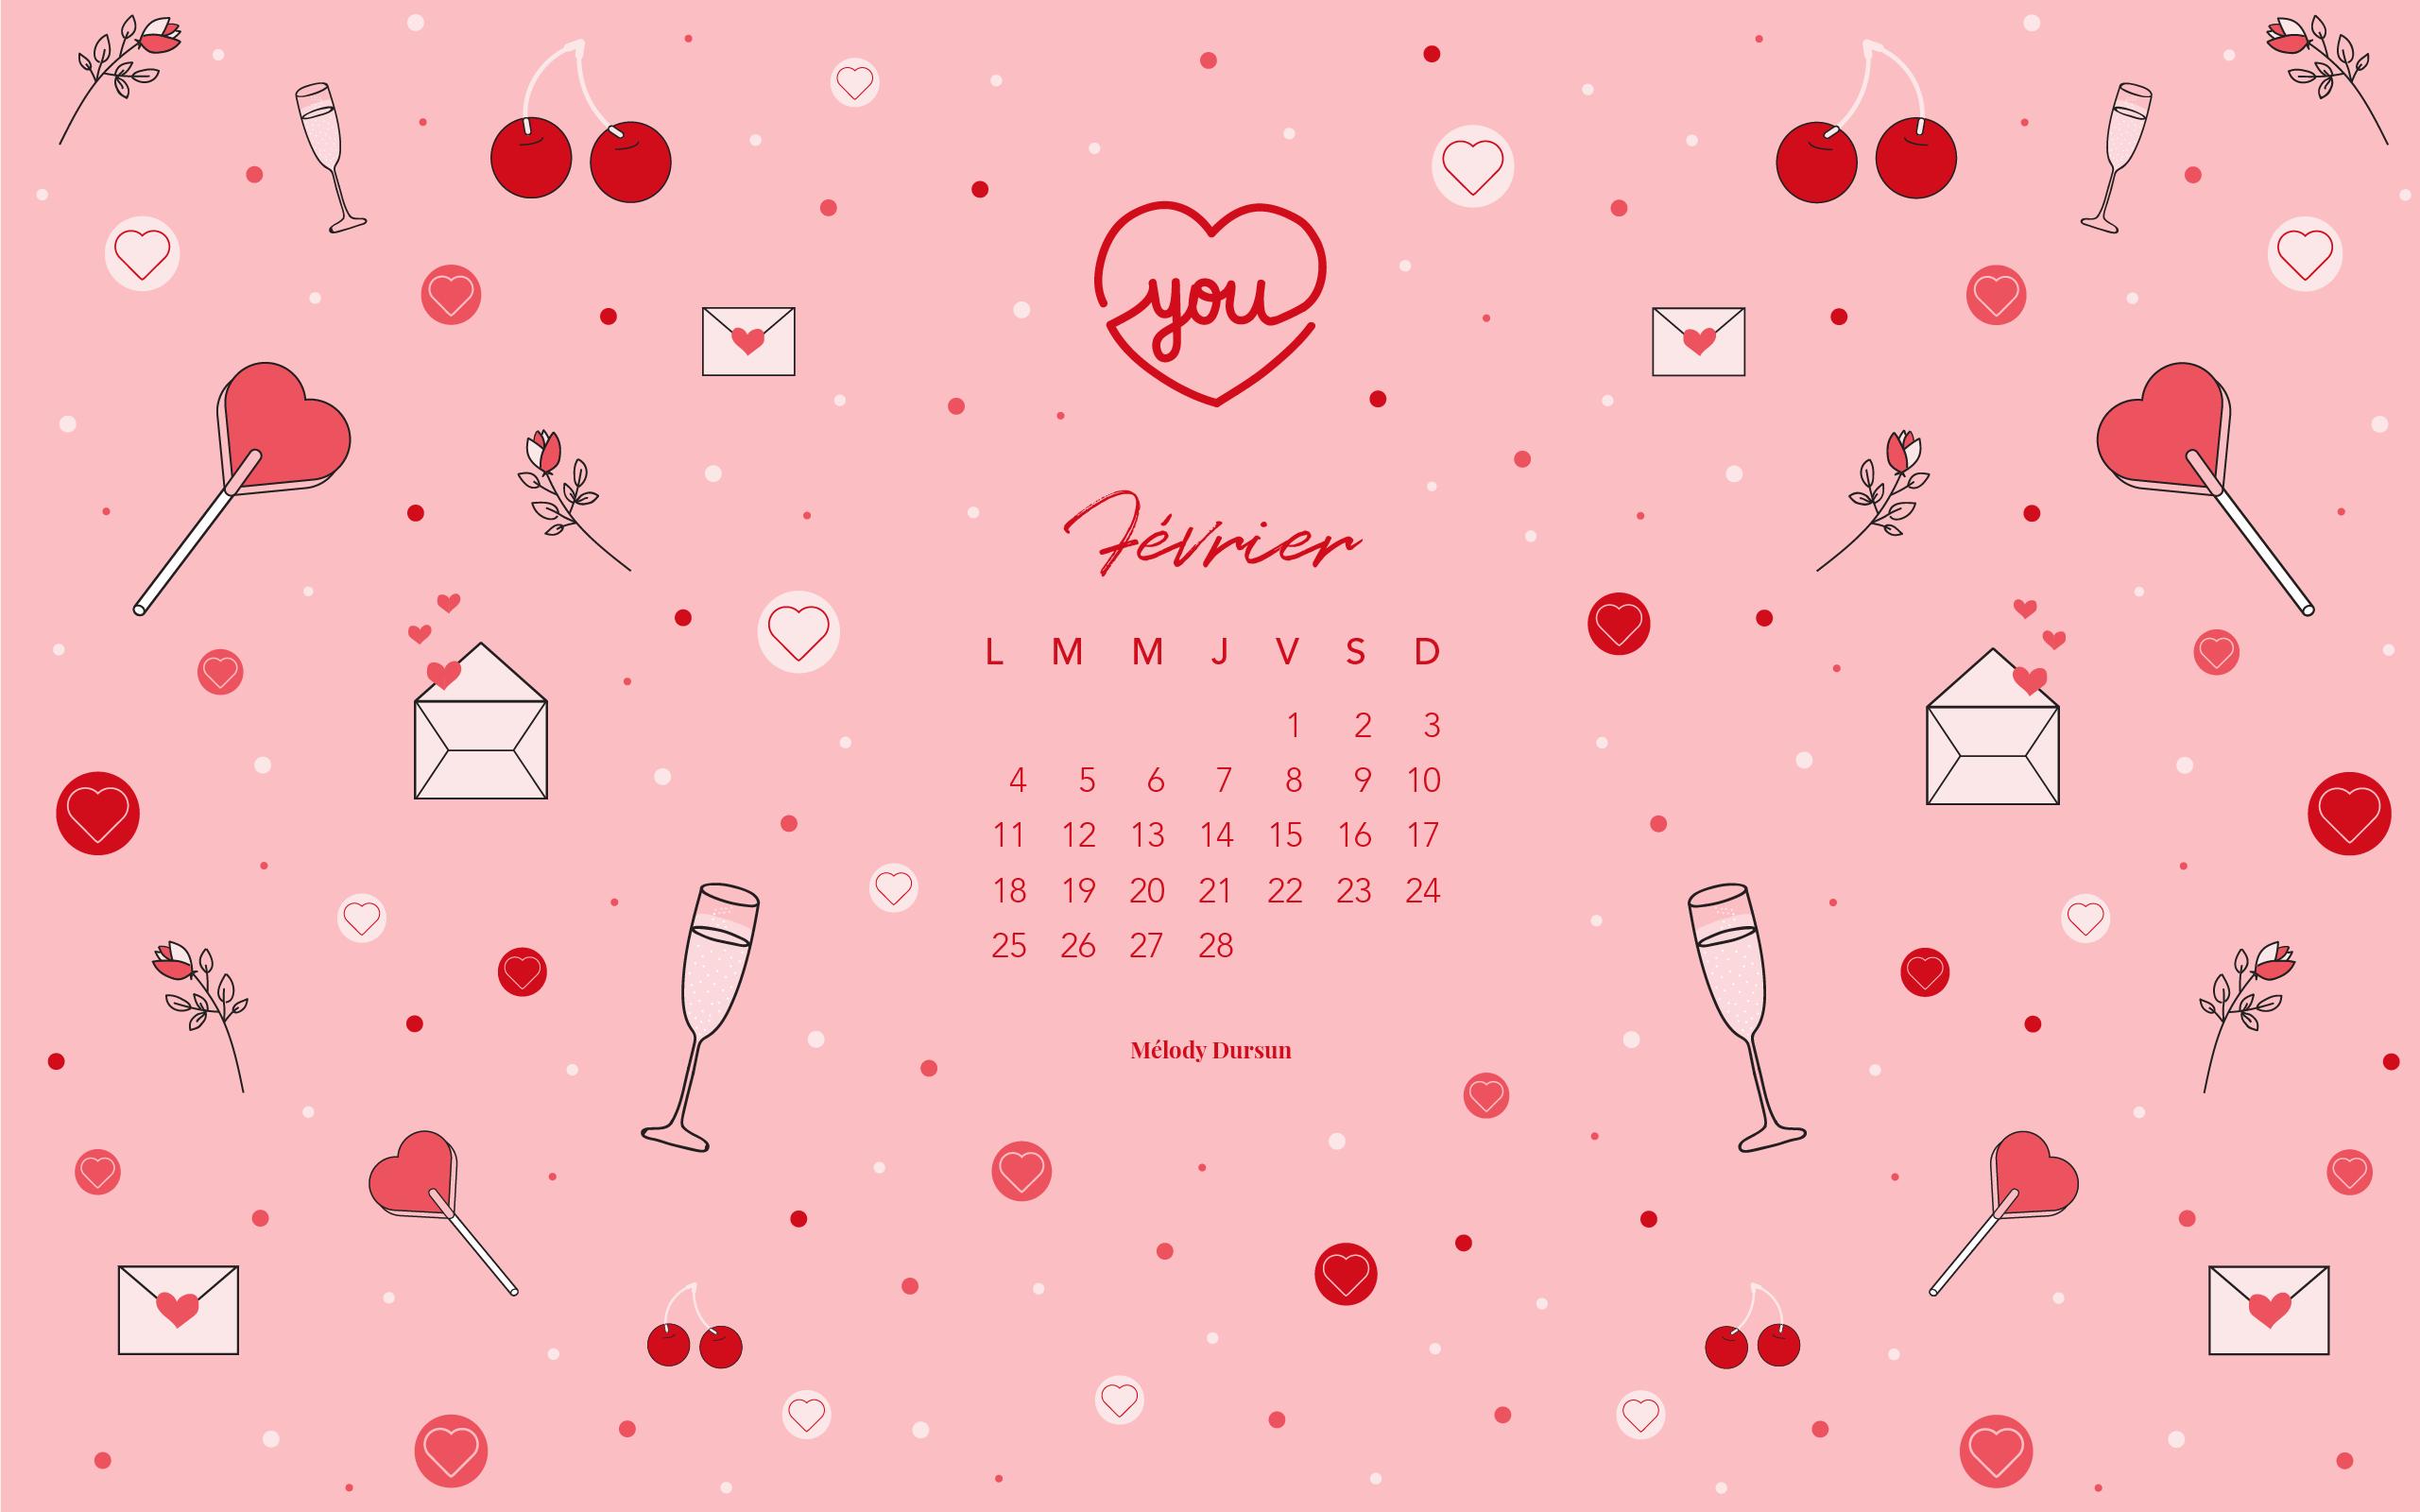 melodydursun-calendrier-fevrier2019